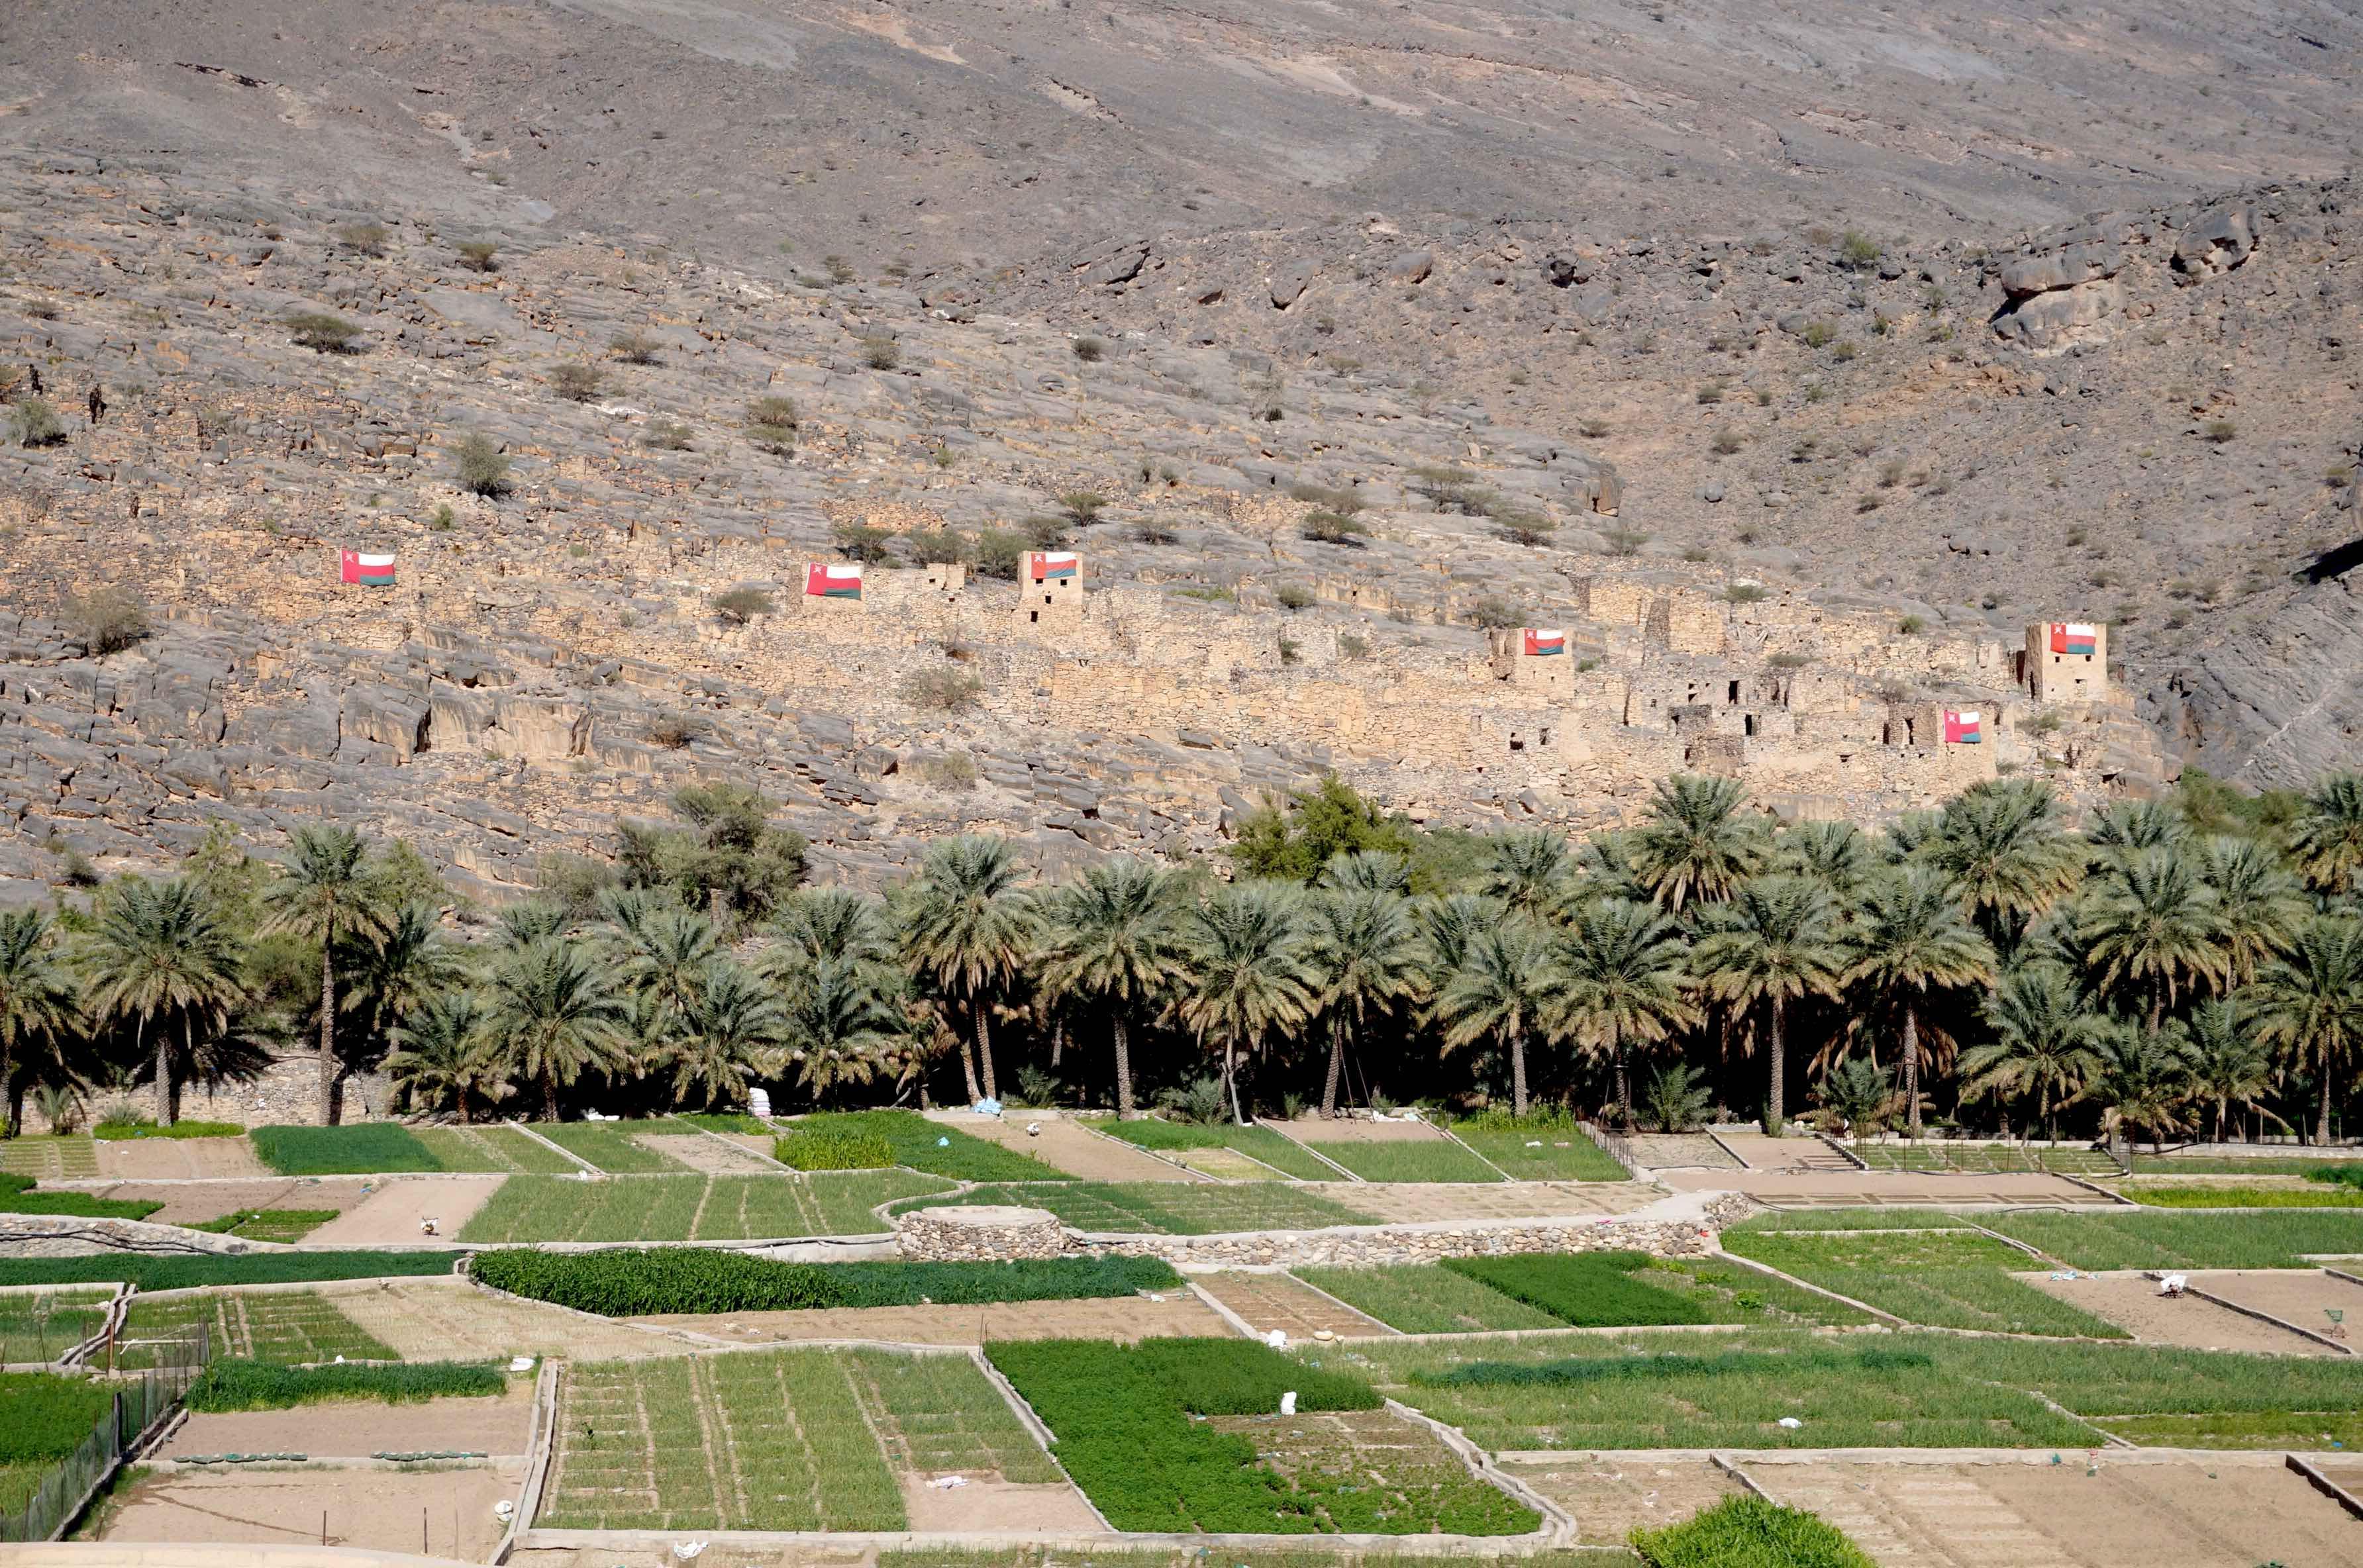 village abandonné, wadi gul, oman